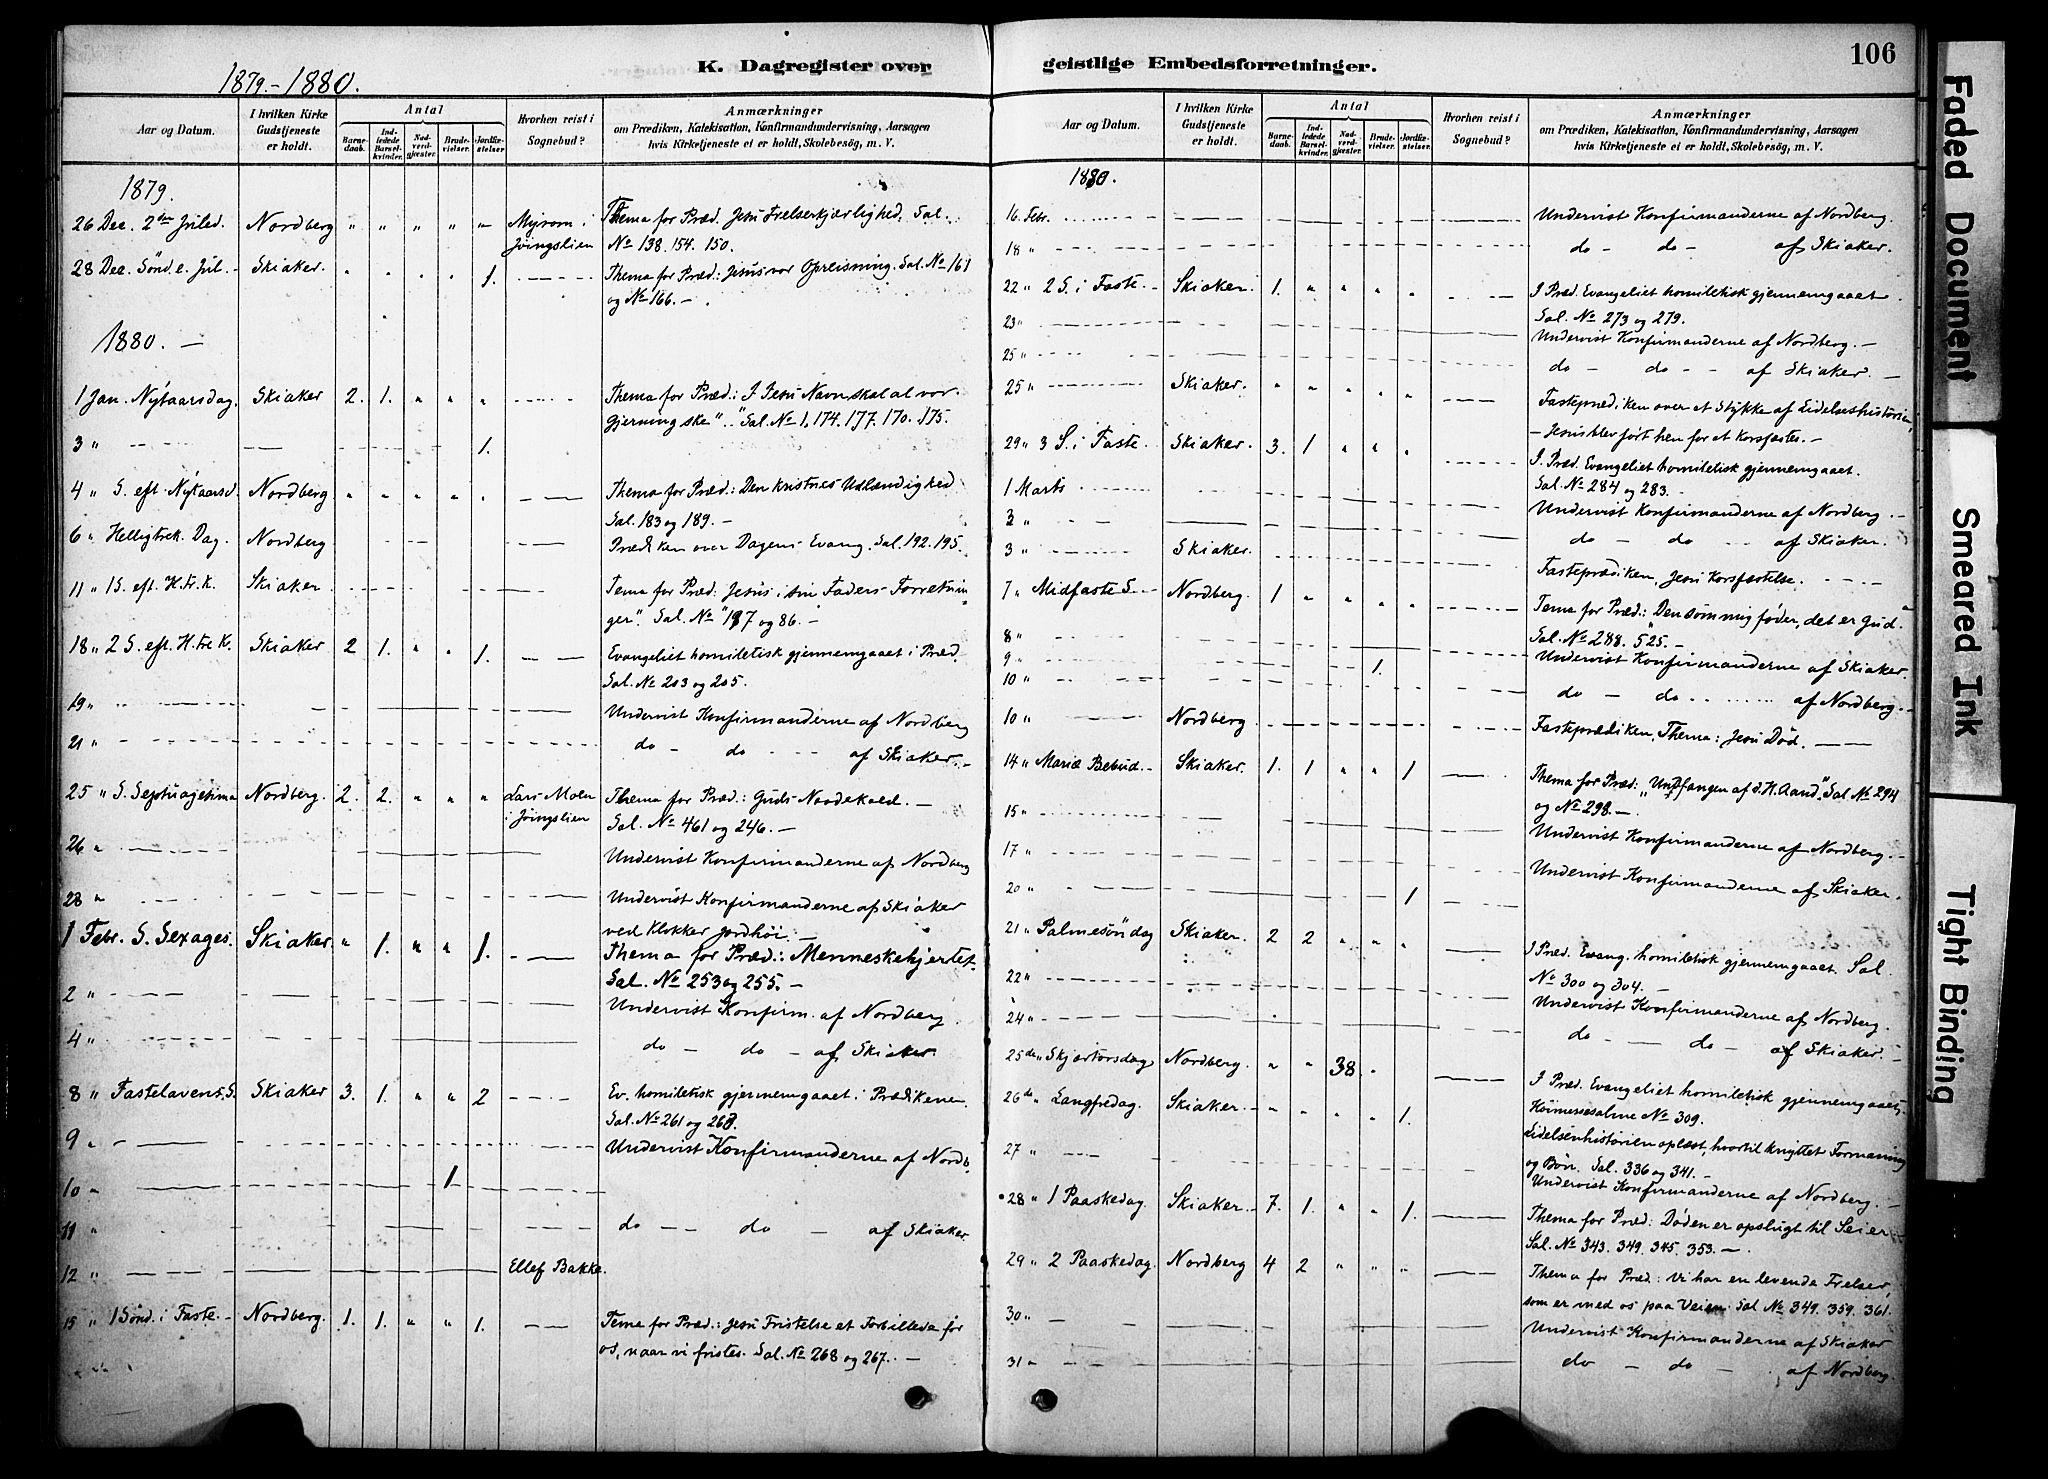 SAH, Skjåk prestekontor, Ministerialbok nr. 2, 1878-1907, s. 106